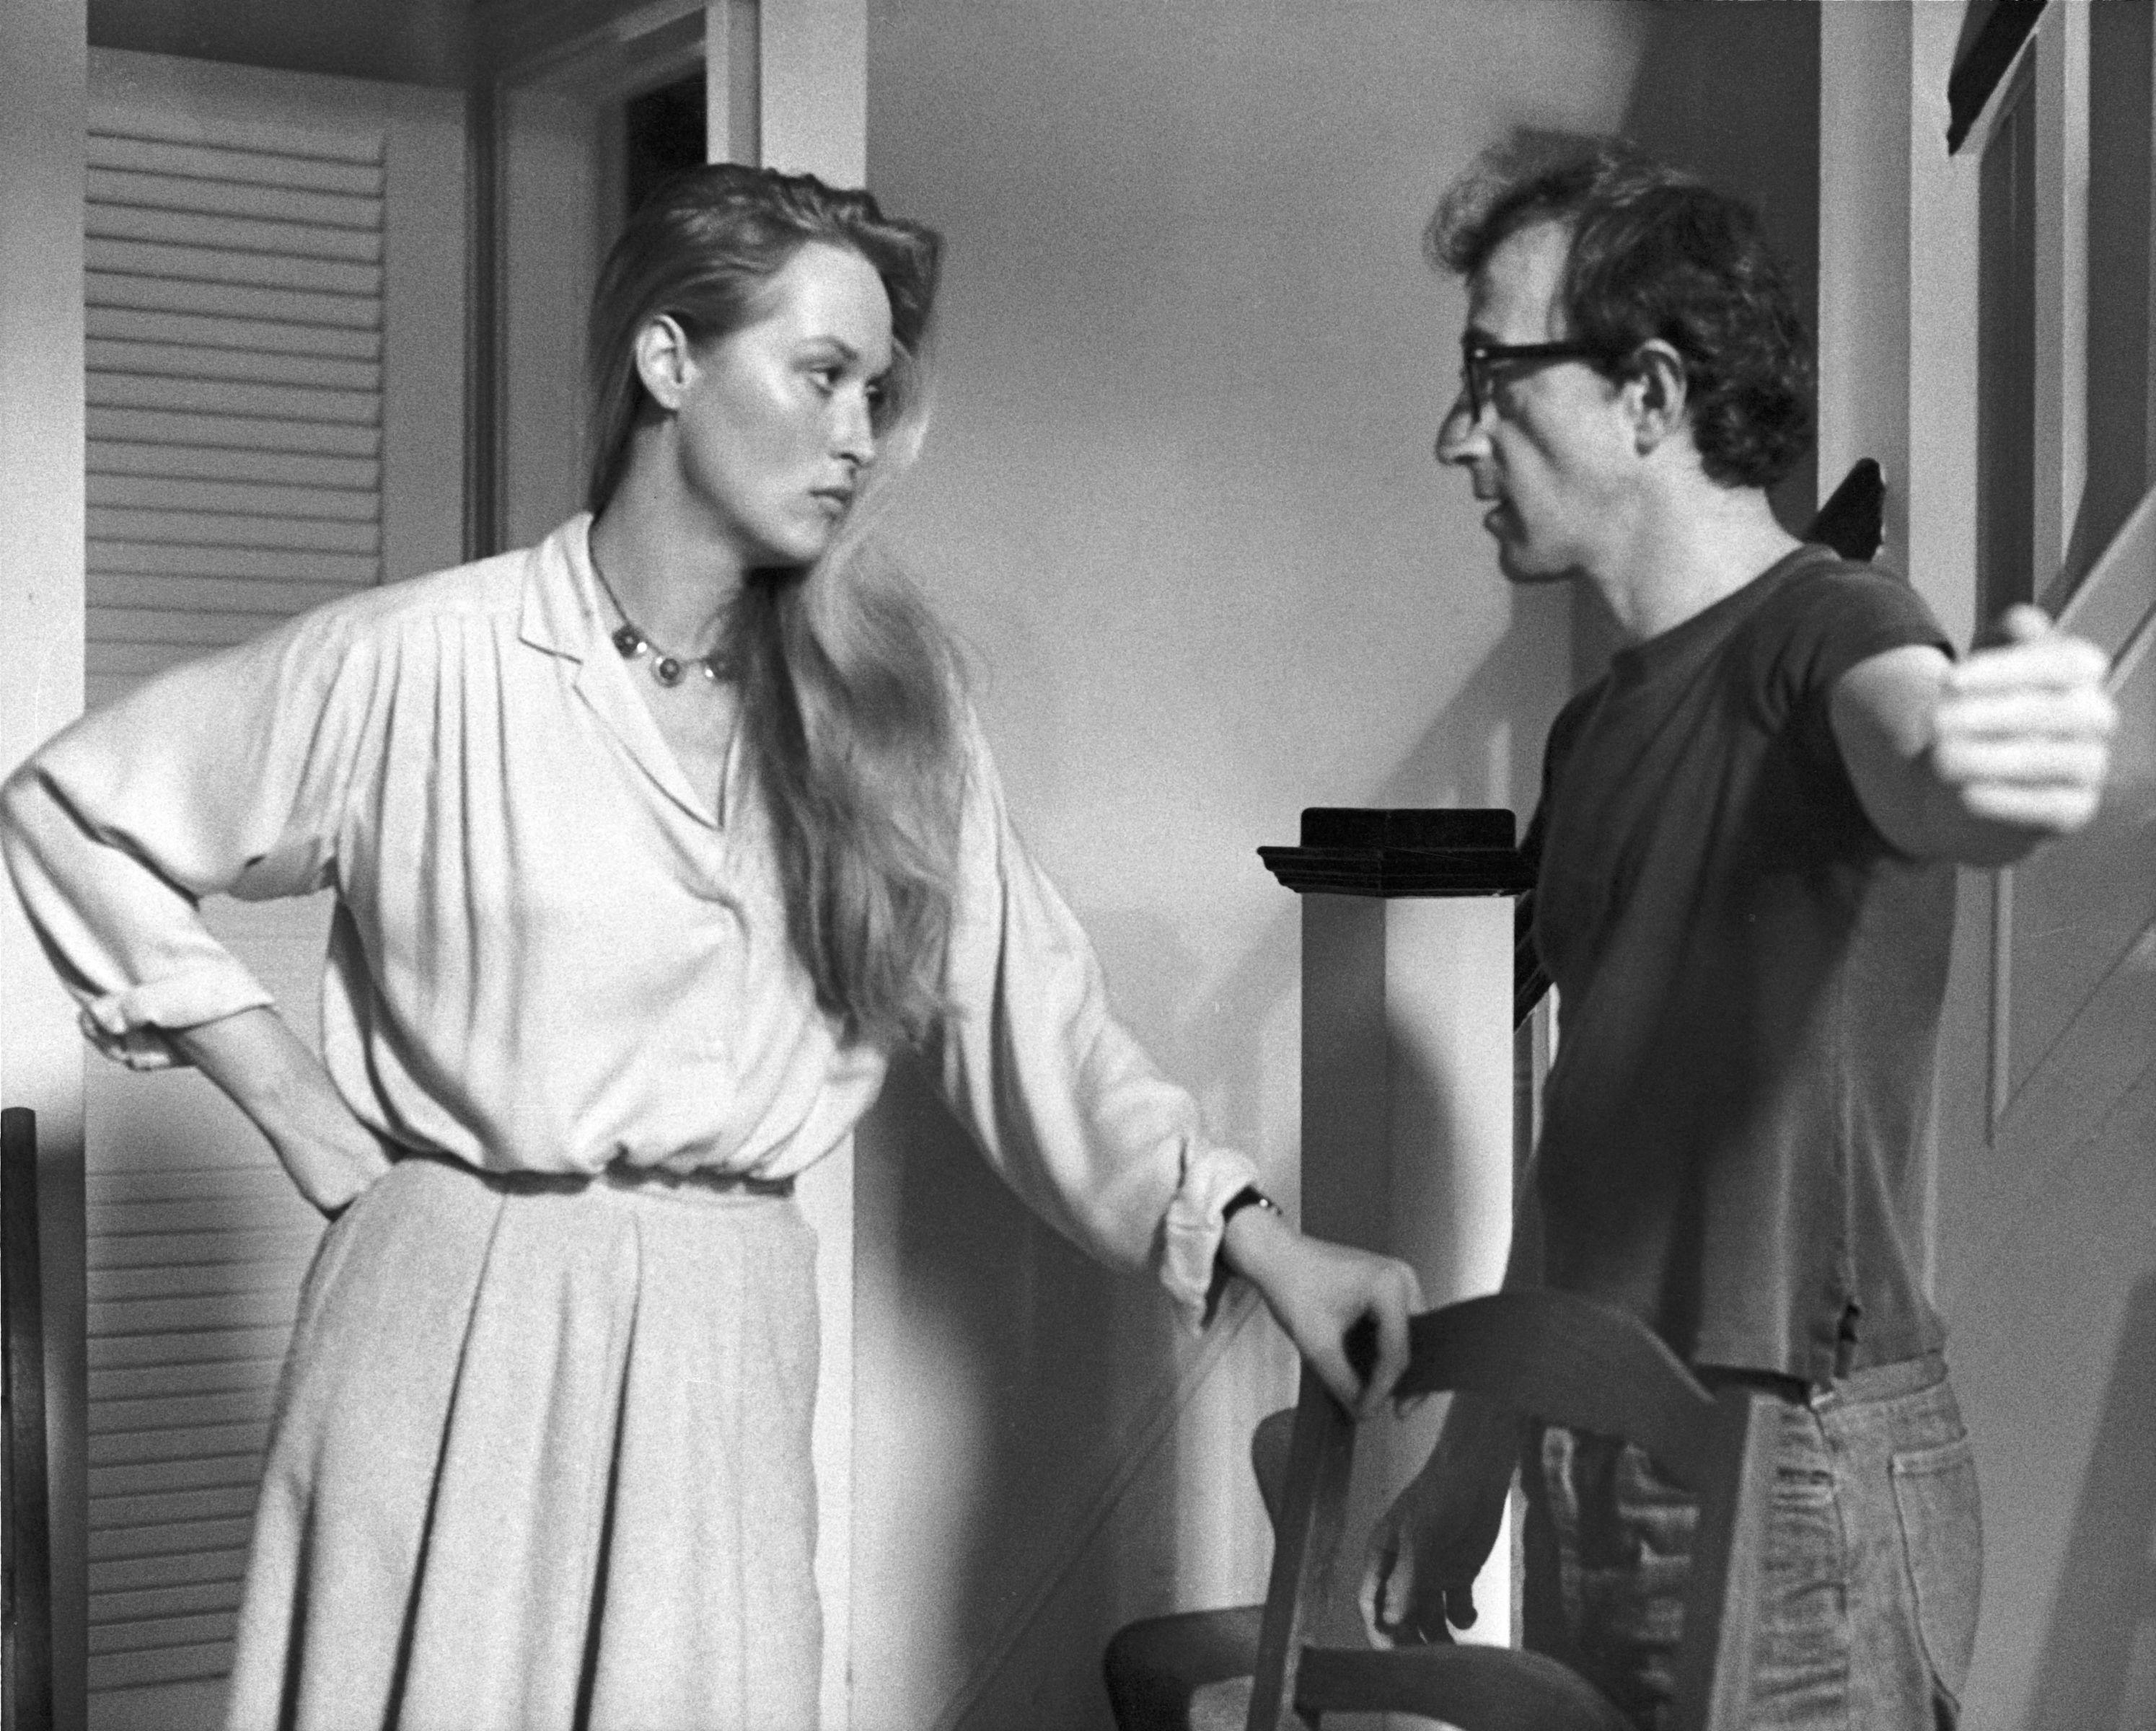 Woody Allen and Meryl Streep in Manhattan (1979)